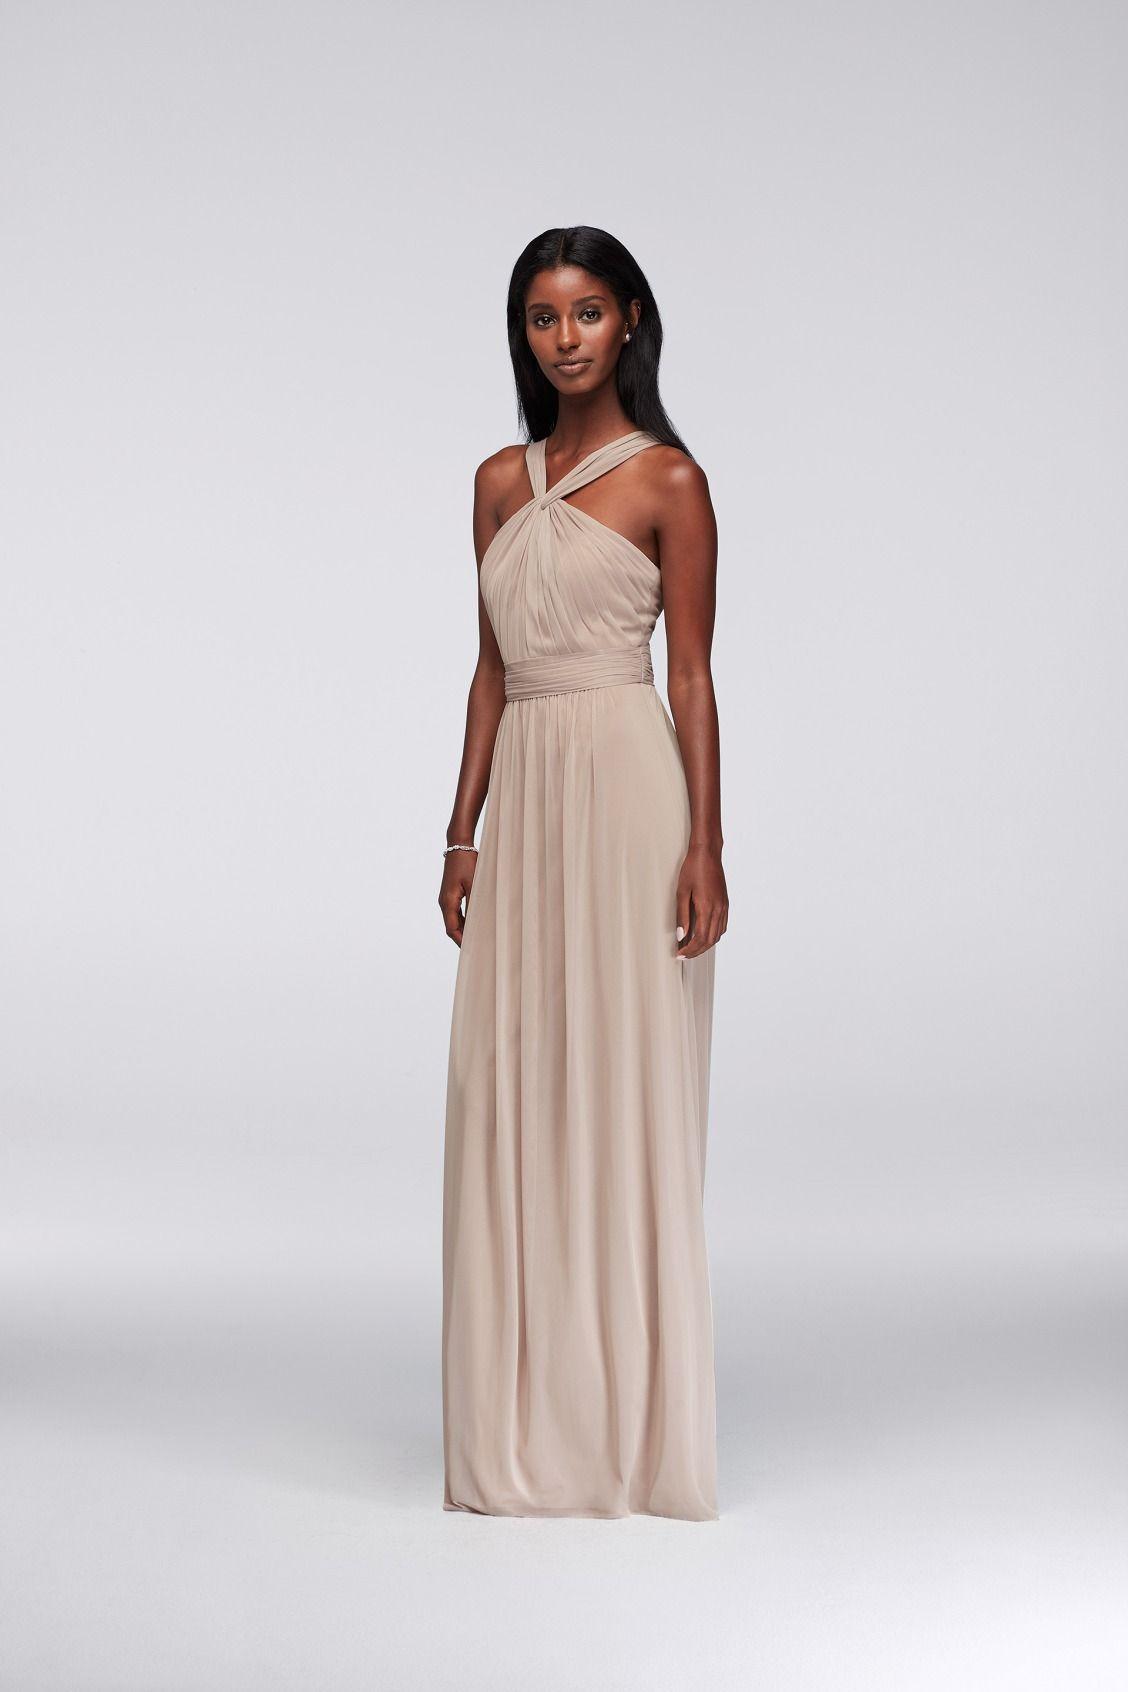 Taupe yneck long mesh bridesmaid dress by davidus bridal